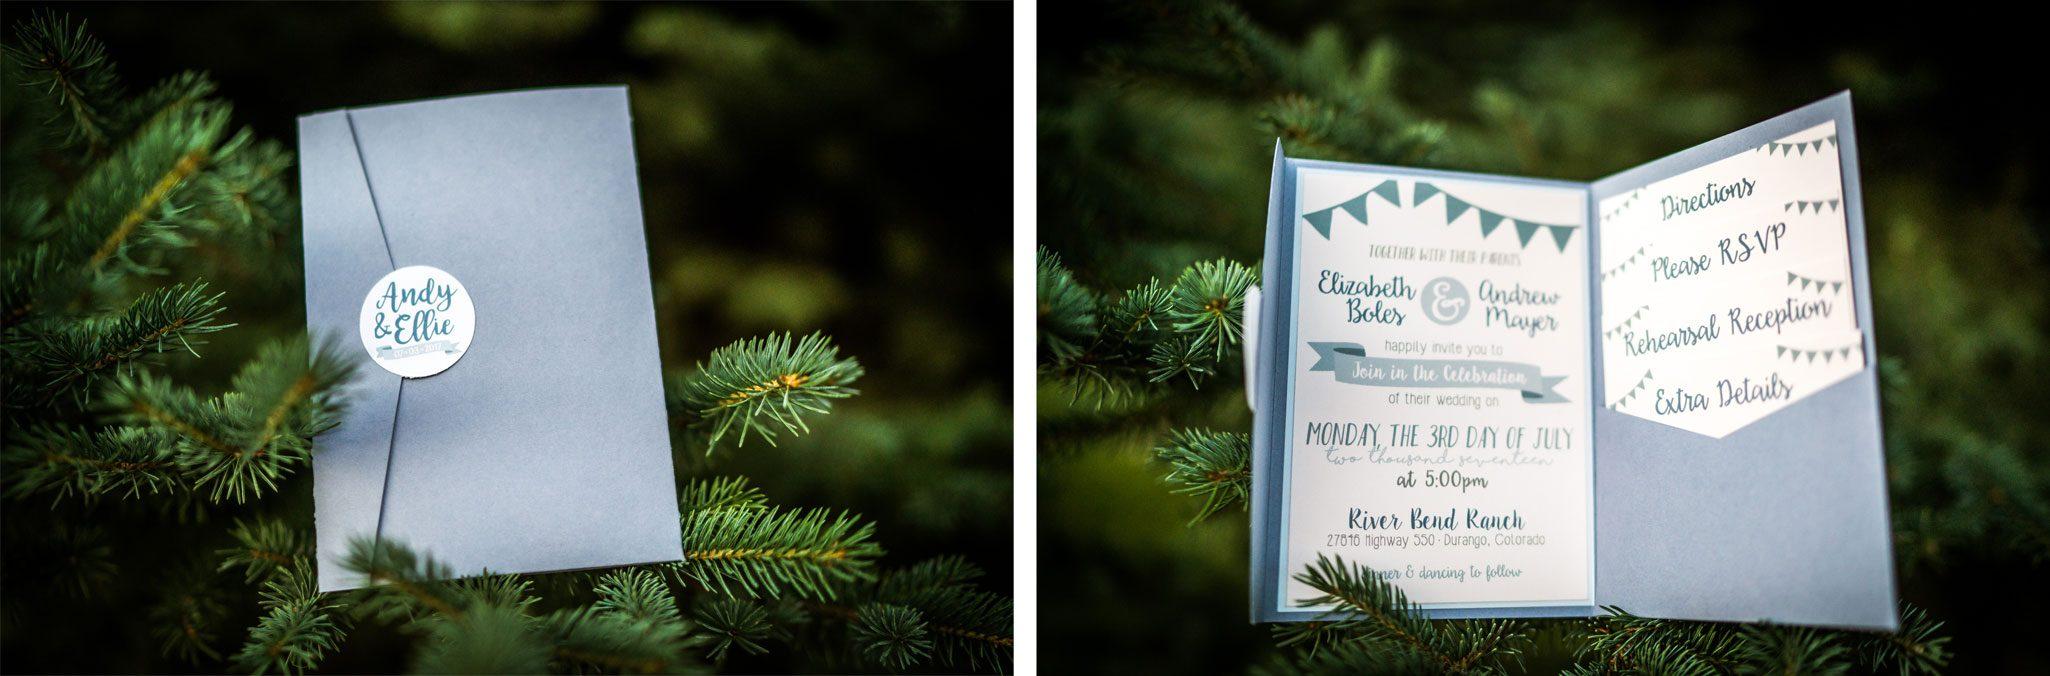 Invitations   Weddings at River Bend Ranch, Durango